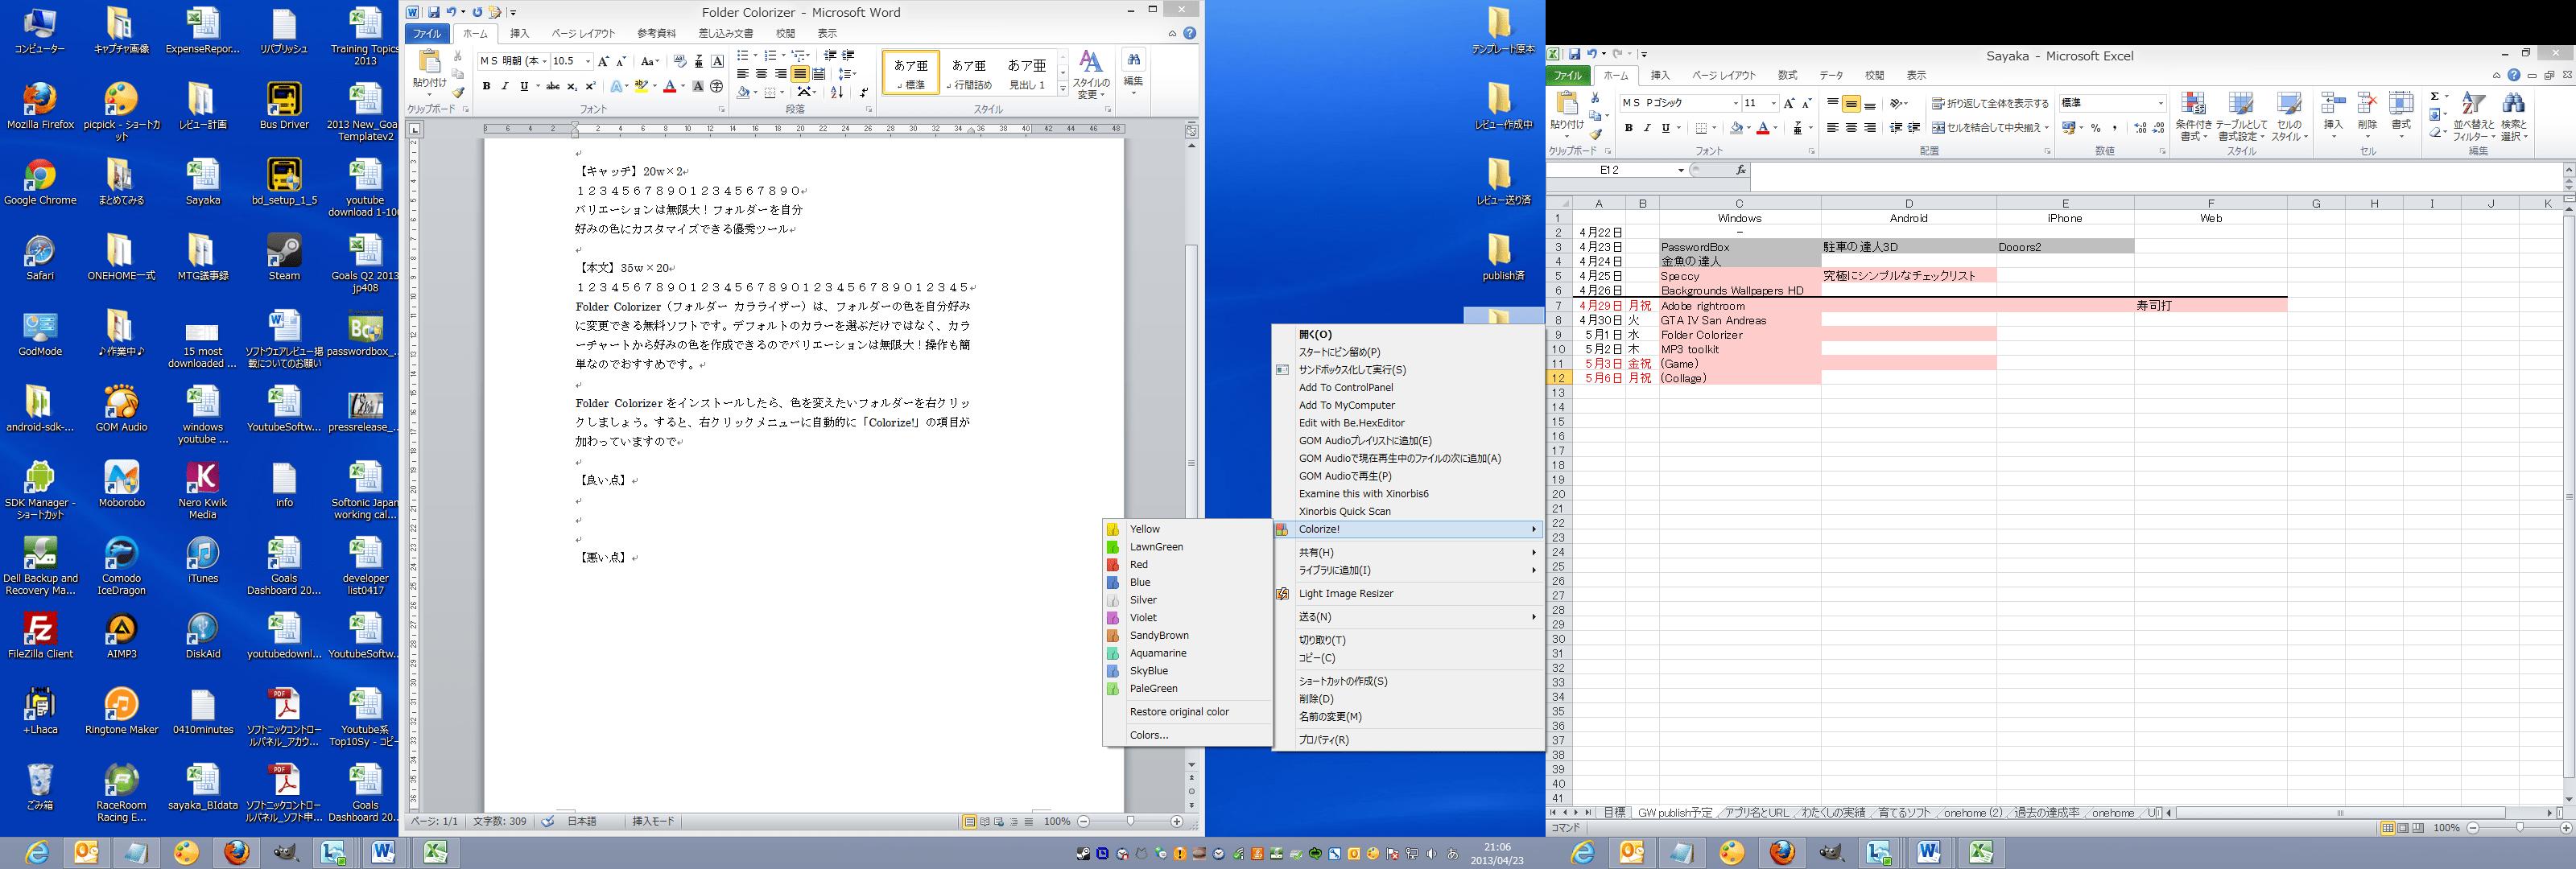 Folder Colorizer